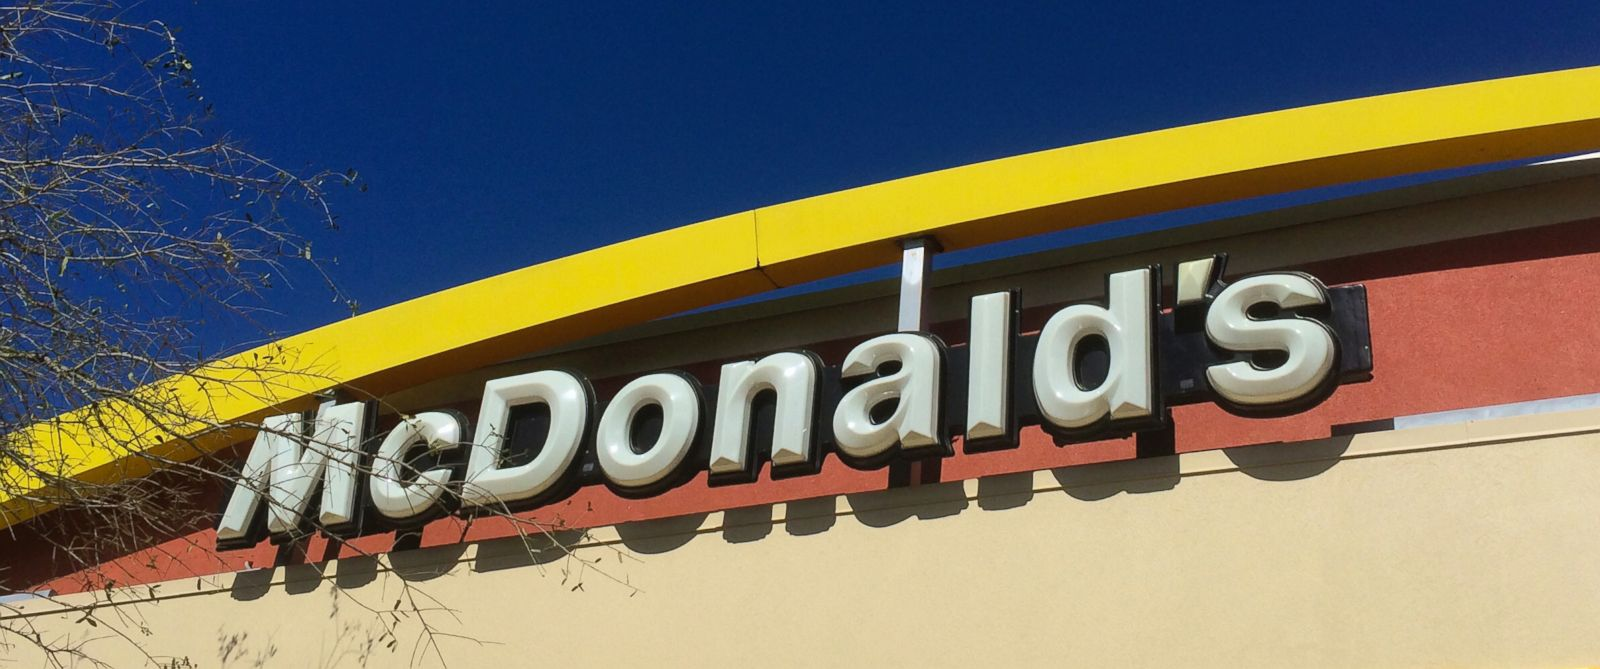 PHOTO: This Jan. 28, 2015 file photo shows a McDonalds restaurant at Marsh Landing Parkway, Jacksonville Beach, Fla.